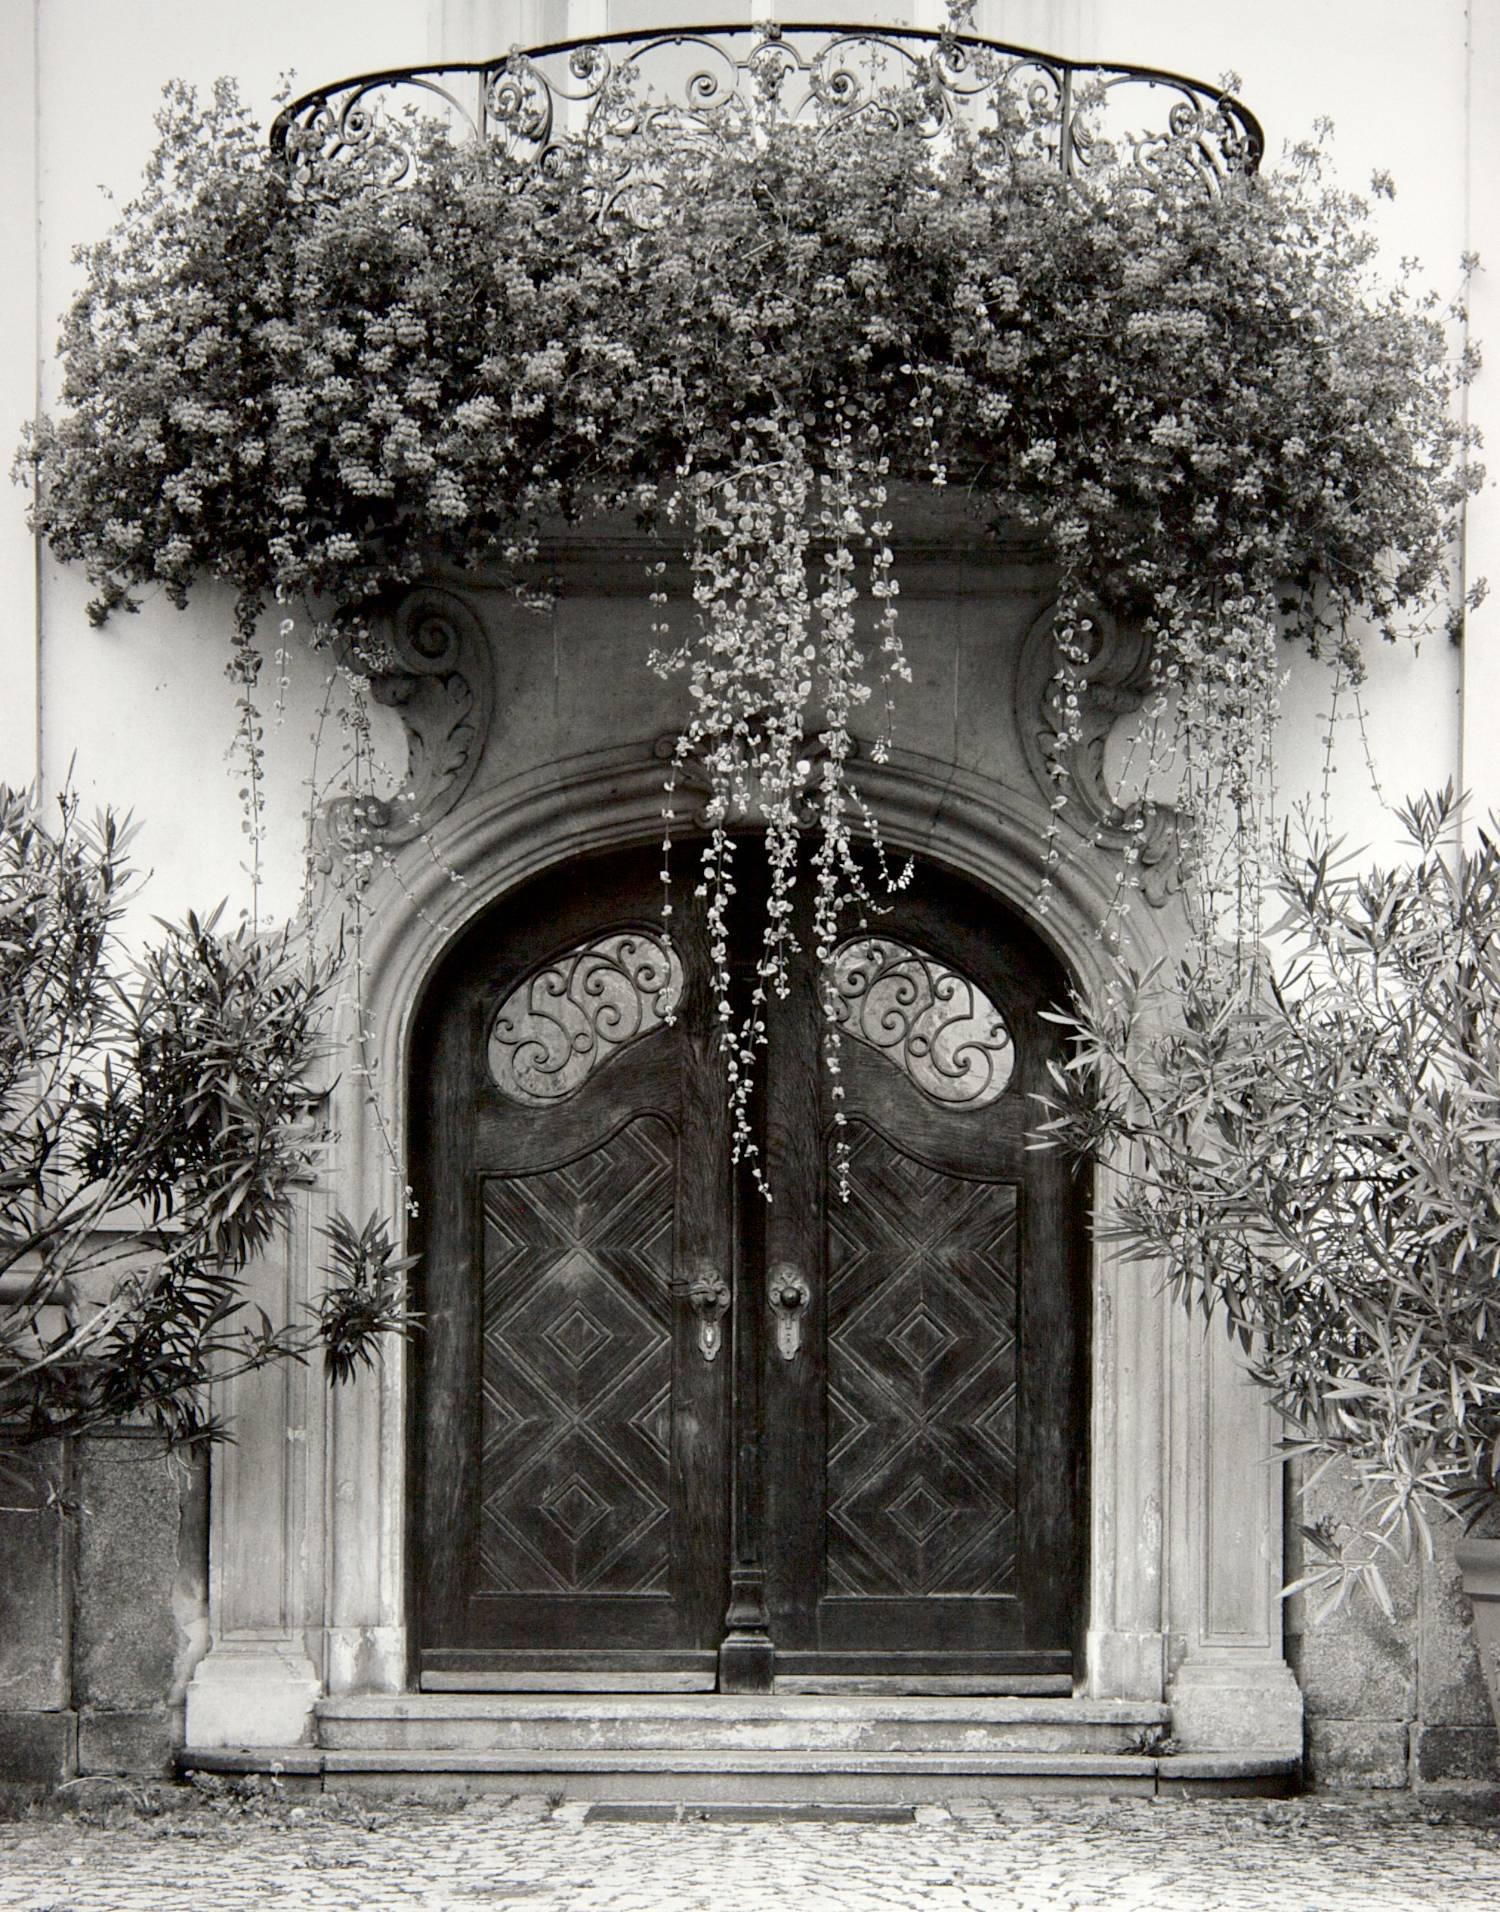 Doors in Passau (Germany)